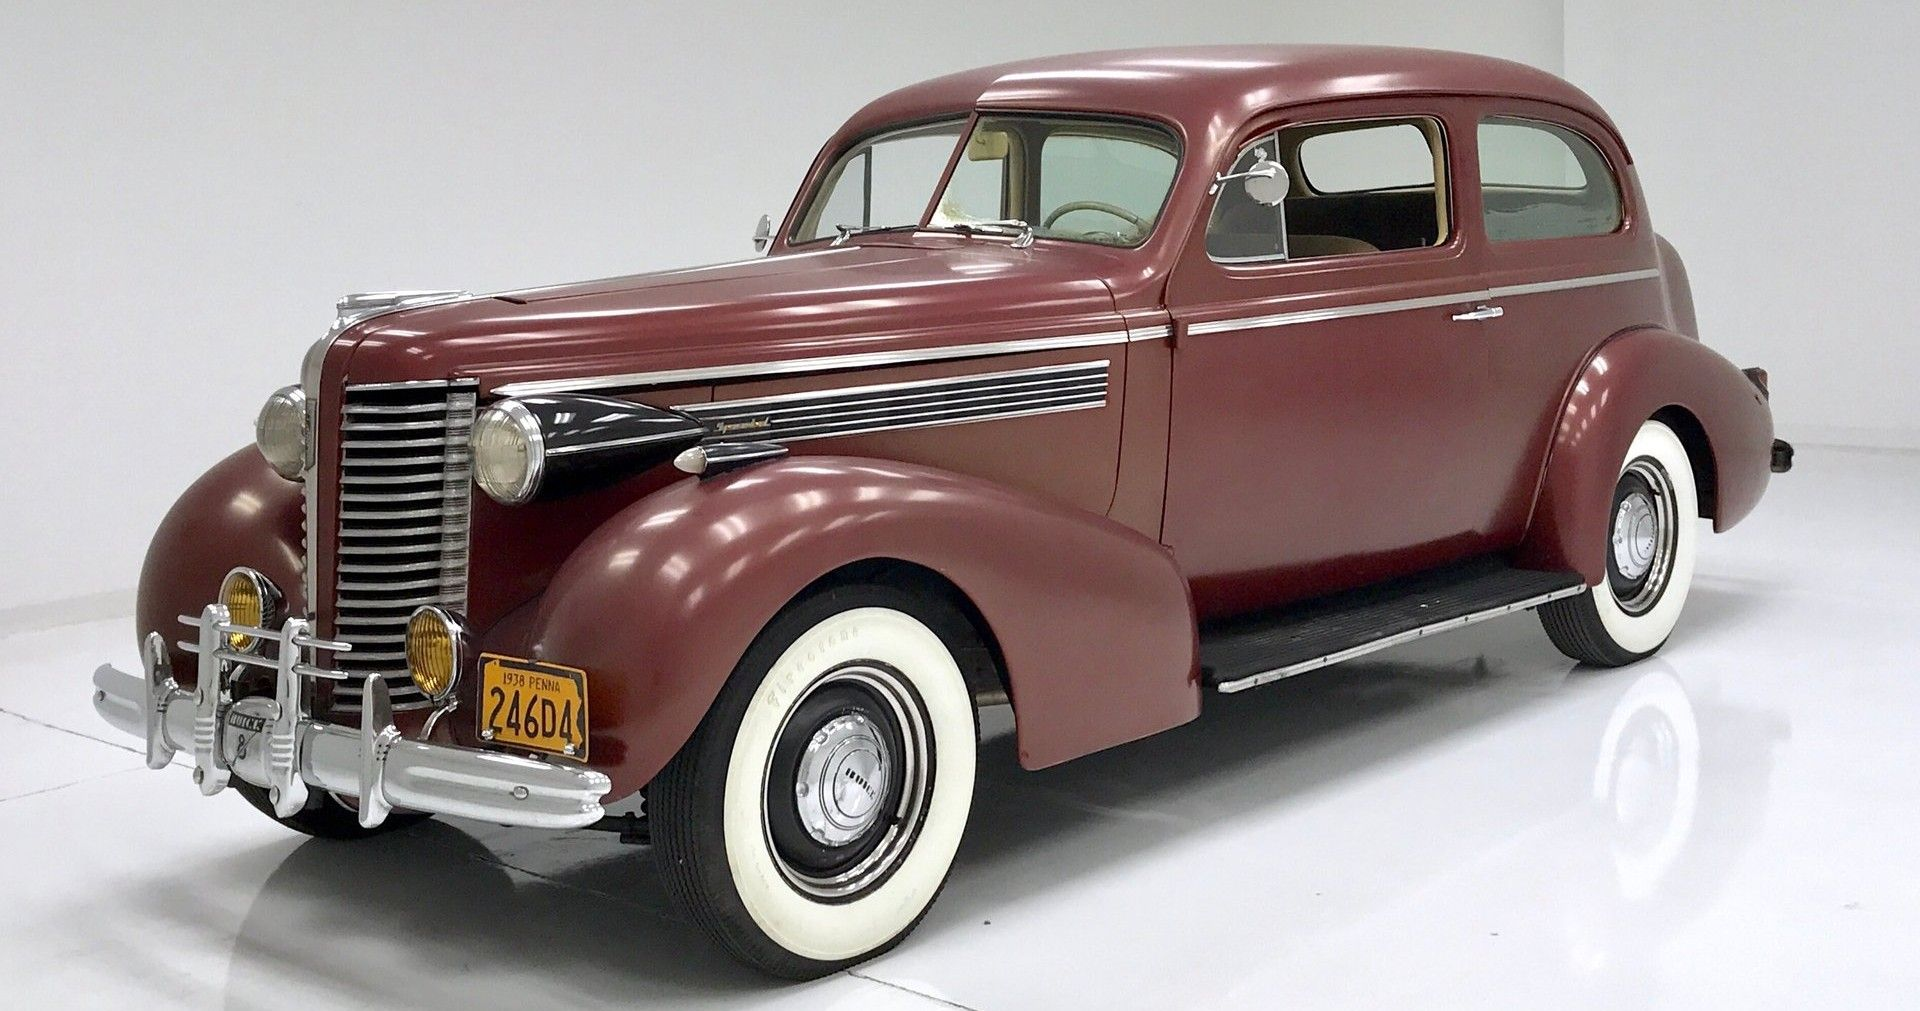 Rust Valley Restorers: An Inside Look At Sarah Ward's 1938 Buick